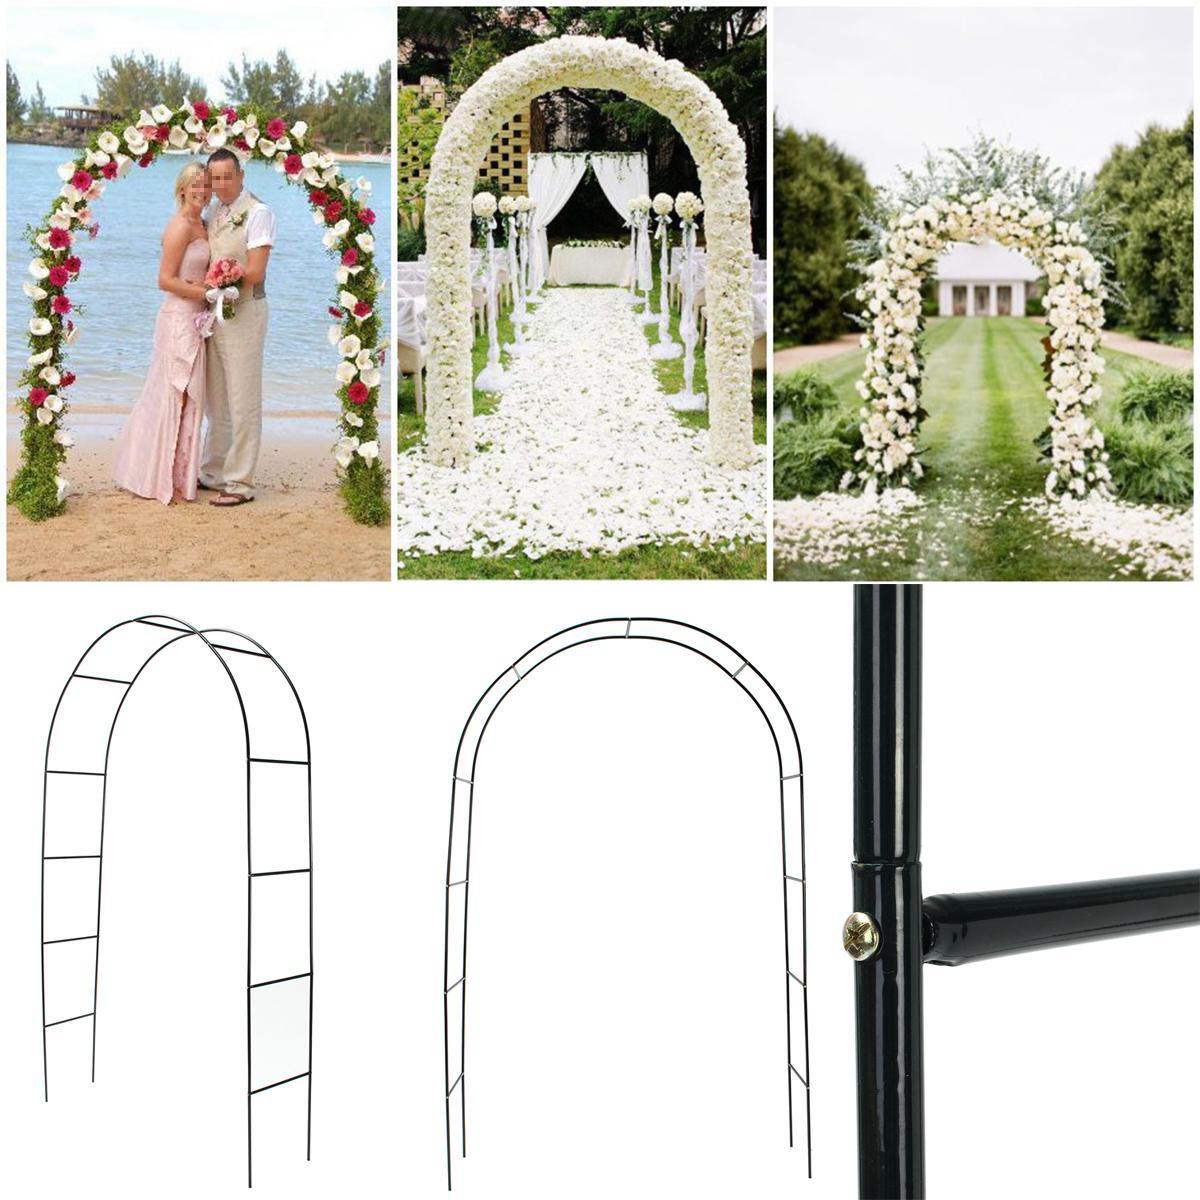 95 Iron Arch Way Assemble Door Wedding Party Bridal Prom Garden Floral Decor